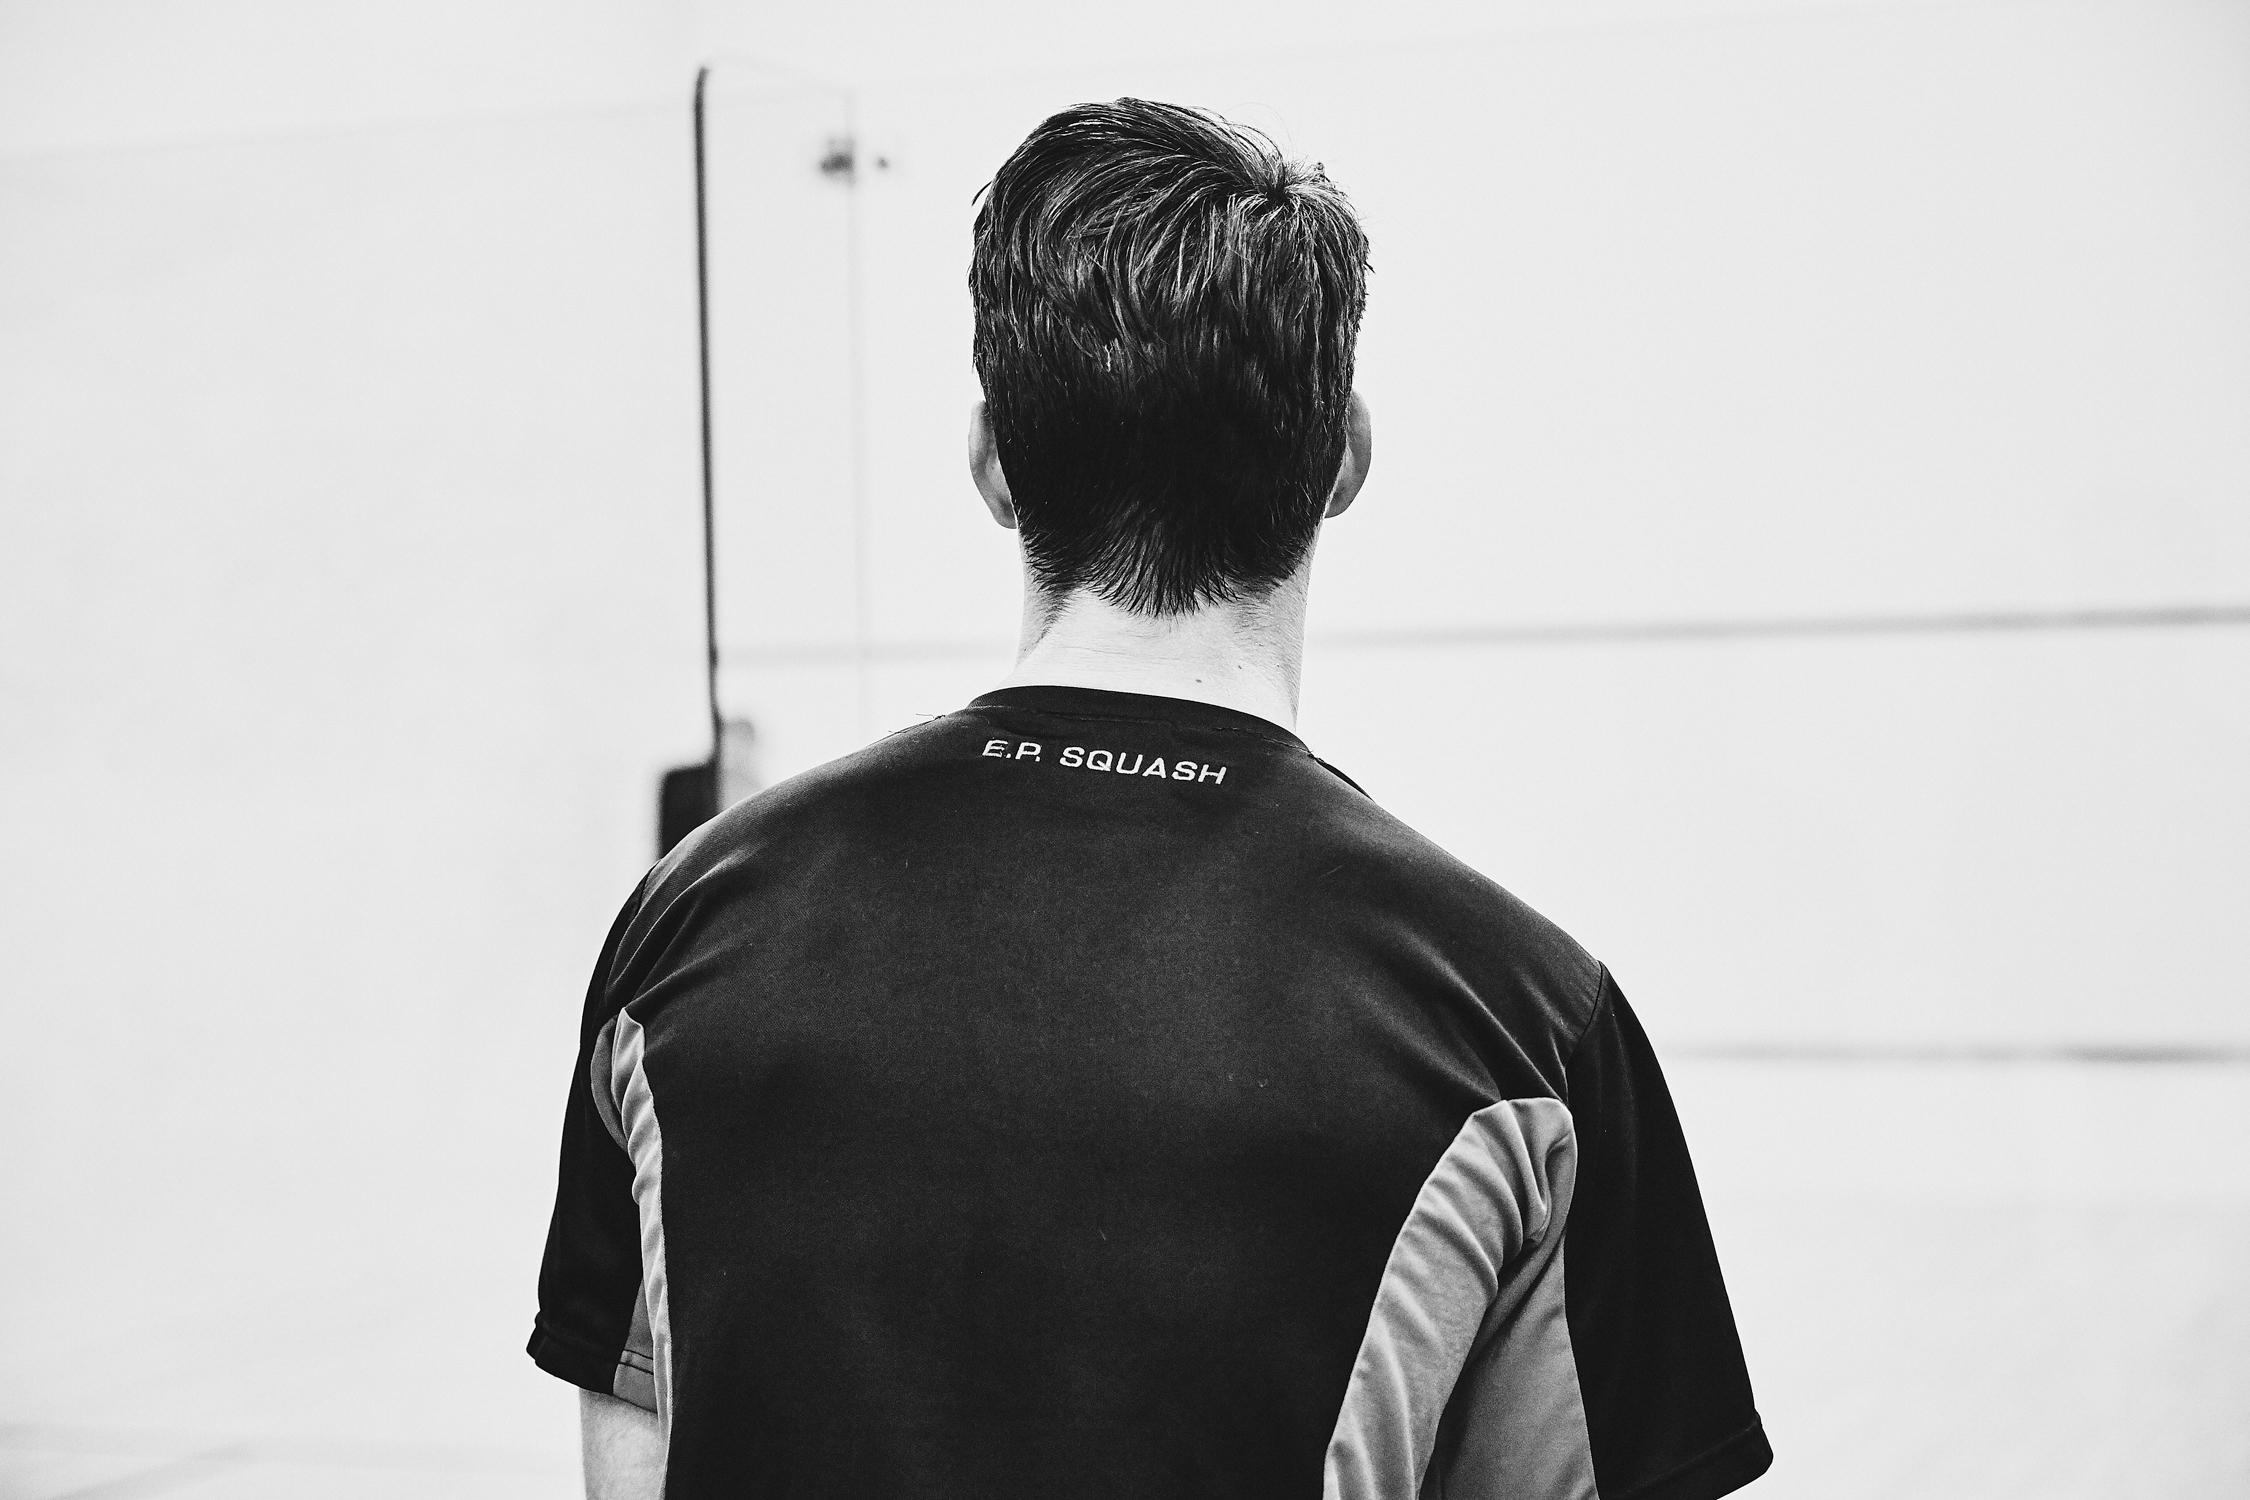 squash_1.jpg